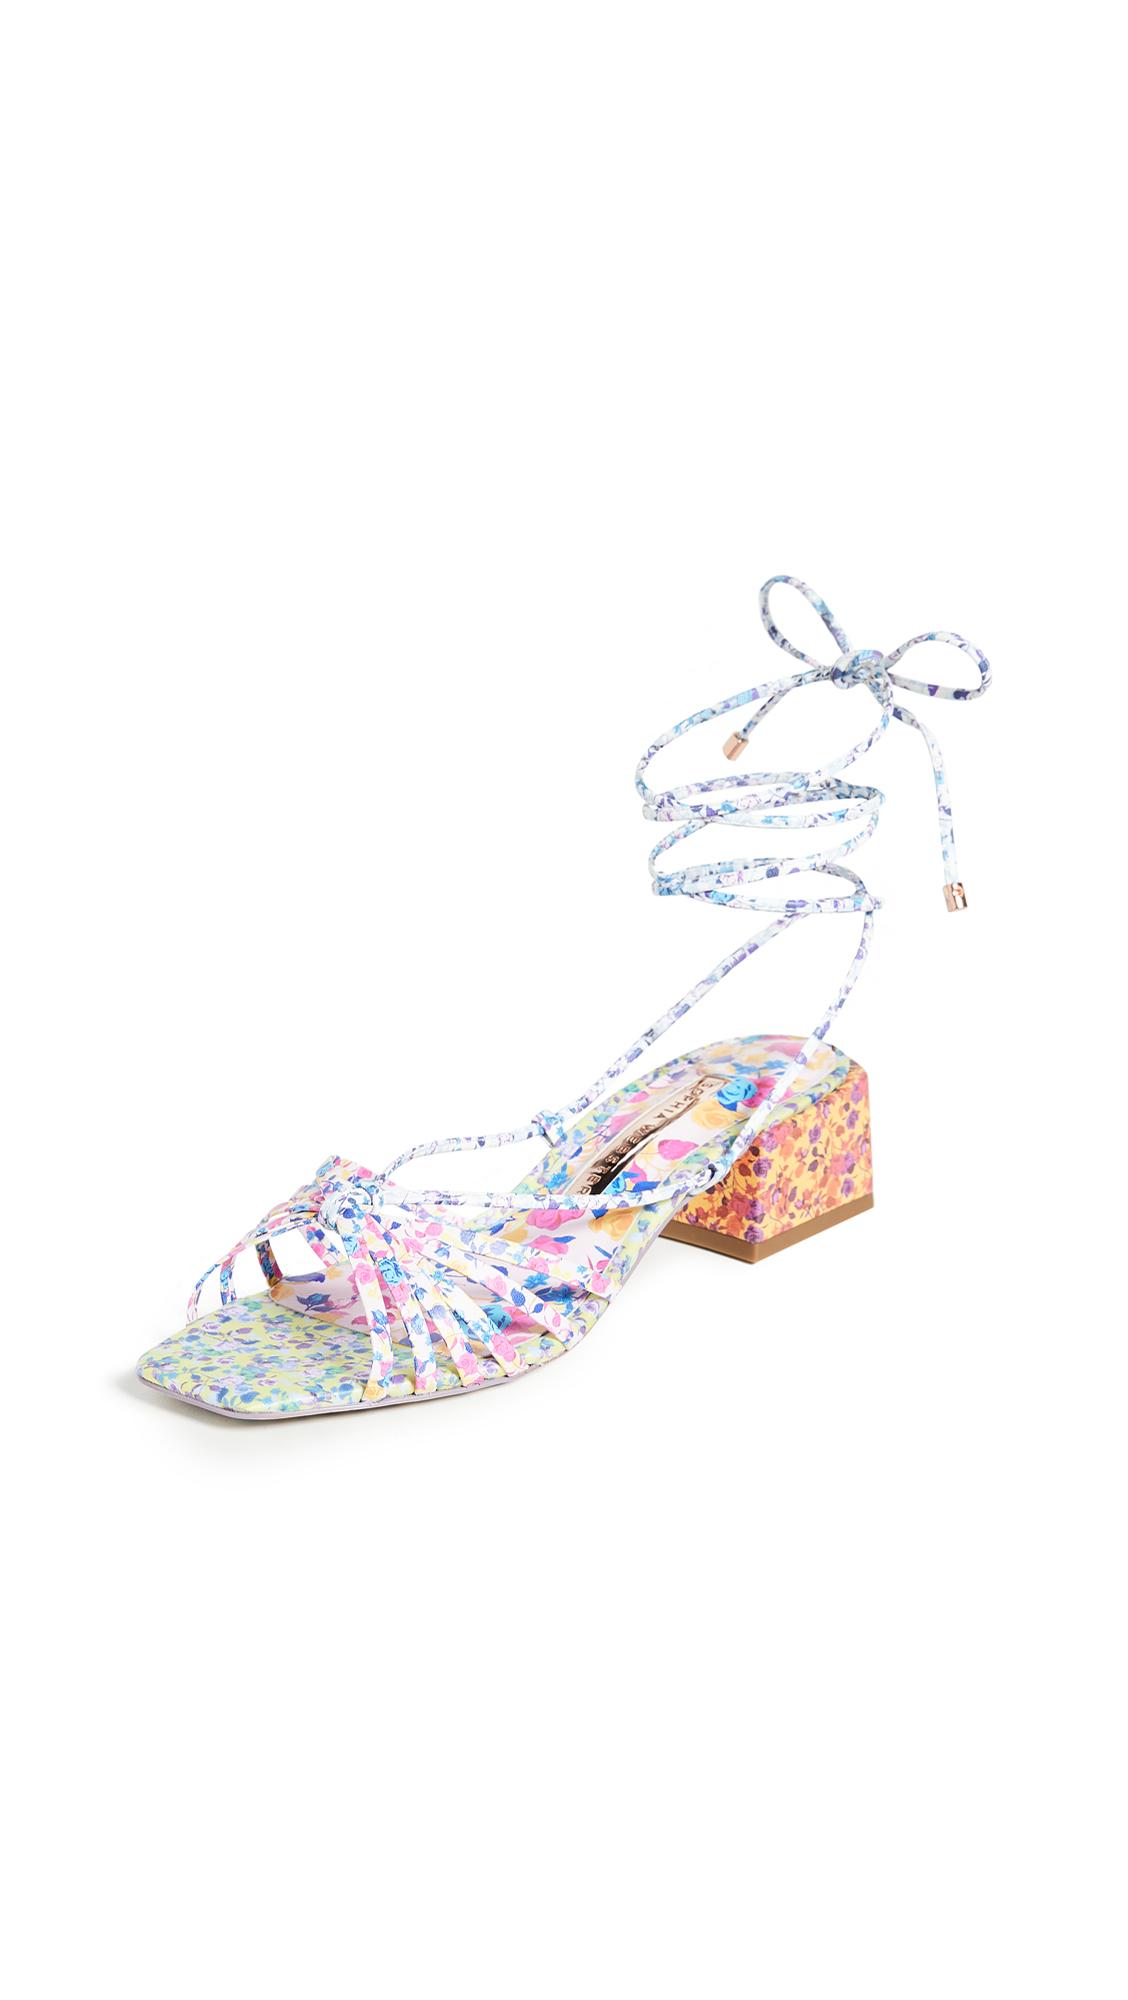 Sophia Webster Laurellie Low Sandals – 55% Off Sale